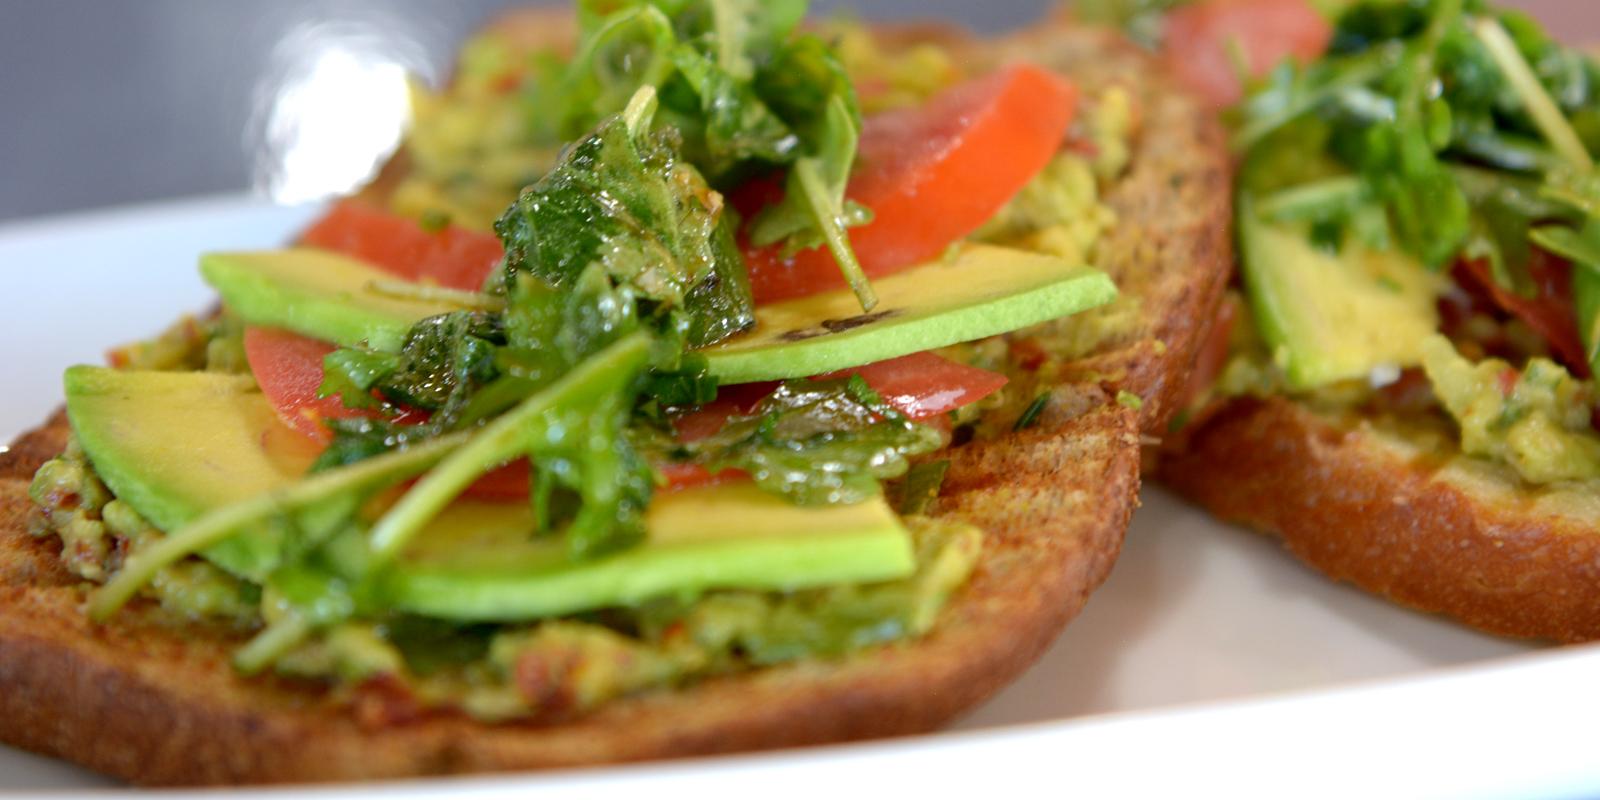 kafe-hub-food-gallery-1.jpg